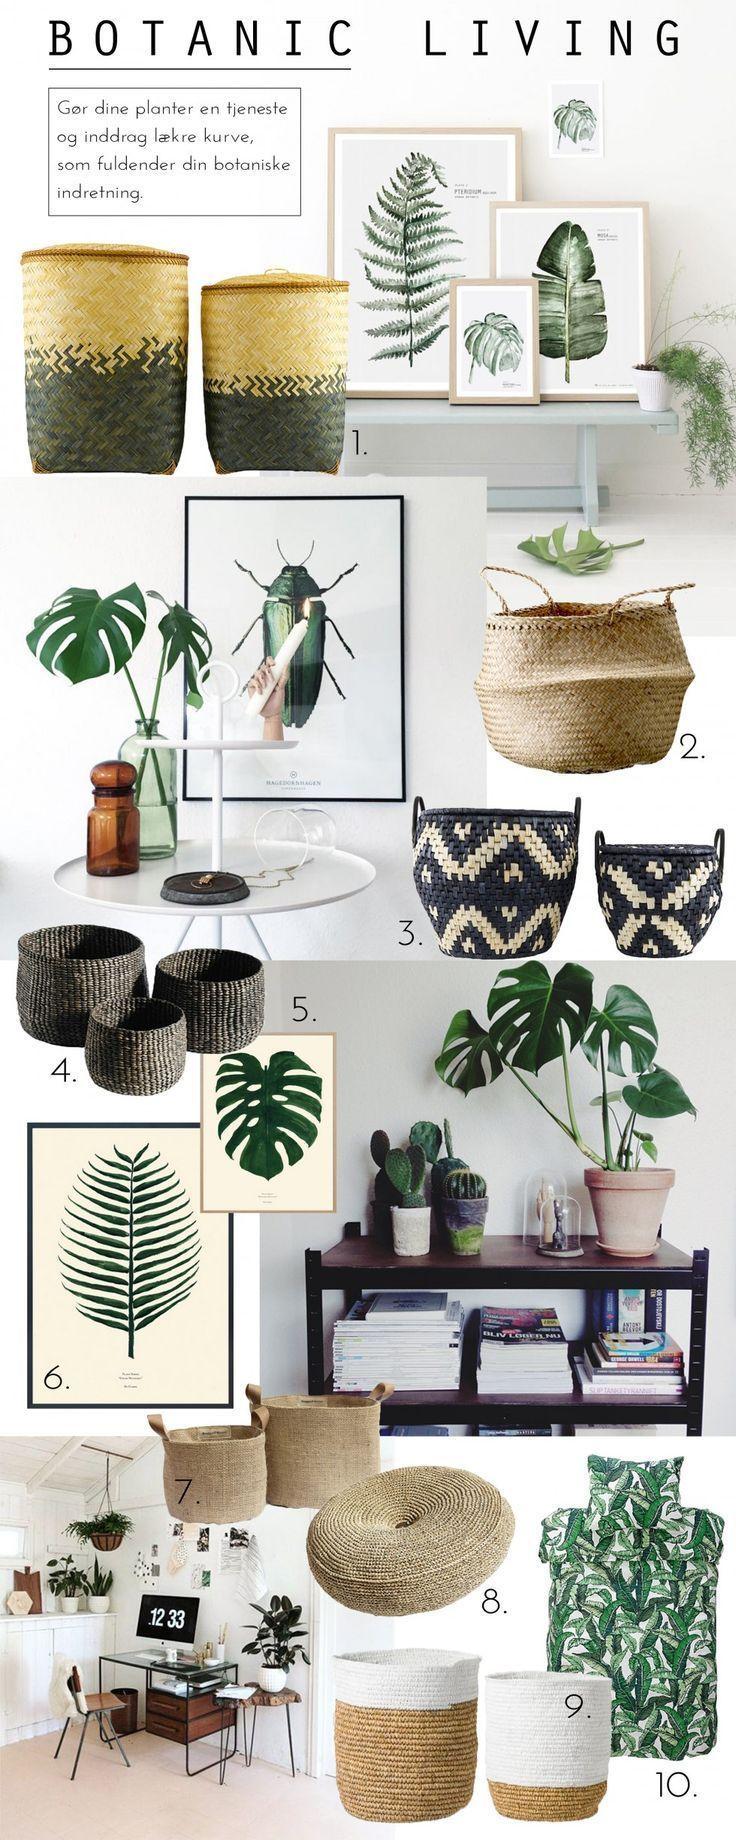 Botanic Living Decor